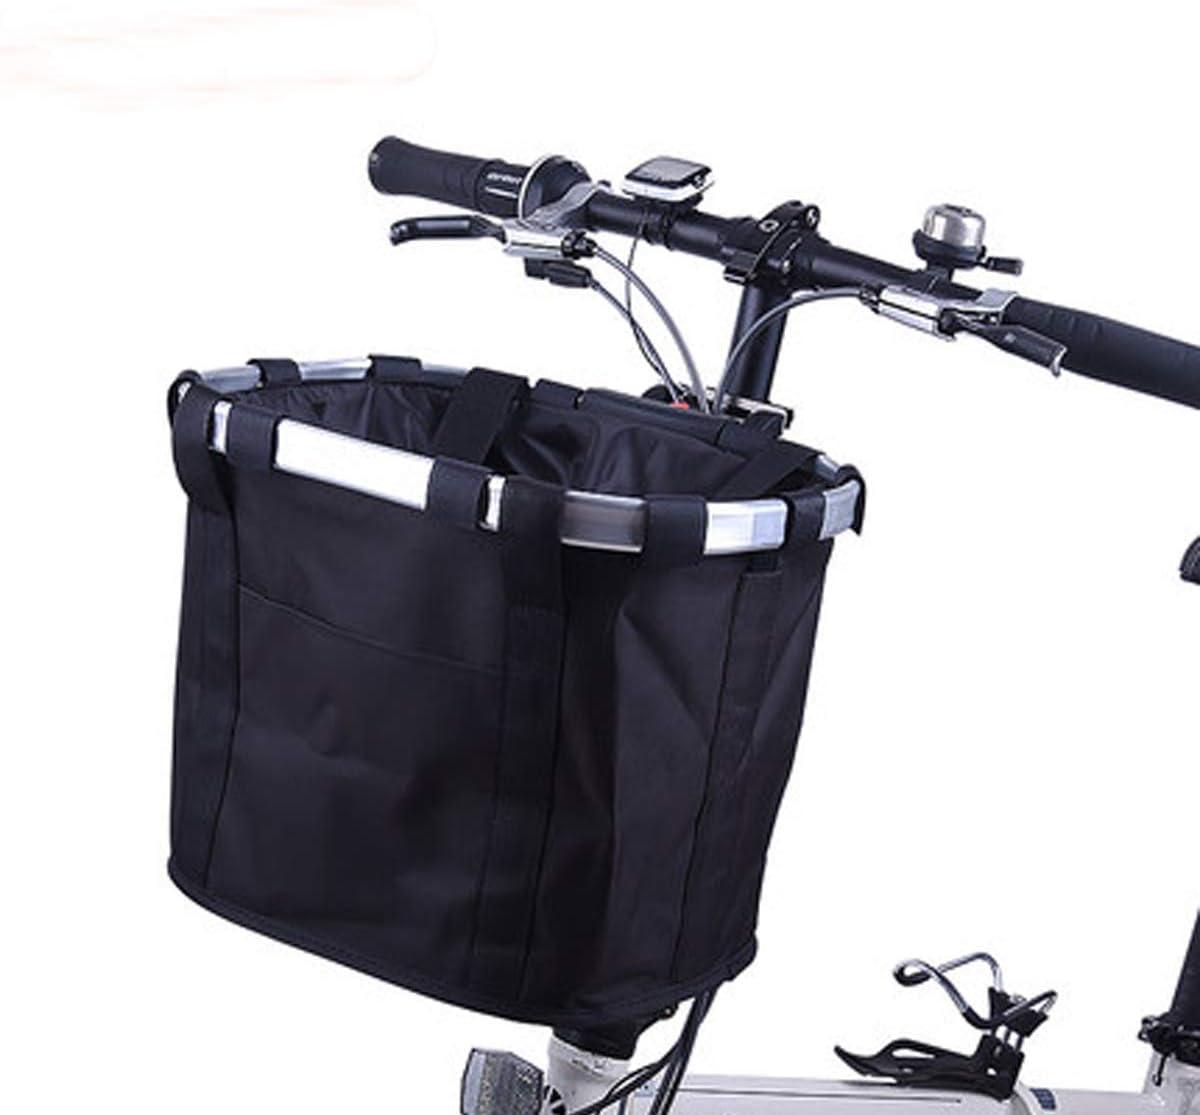 Bicycle Front Basket Removable Waterproof Bike Handlebar Basket Pet Carrier USA